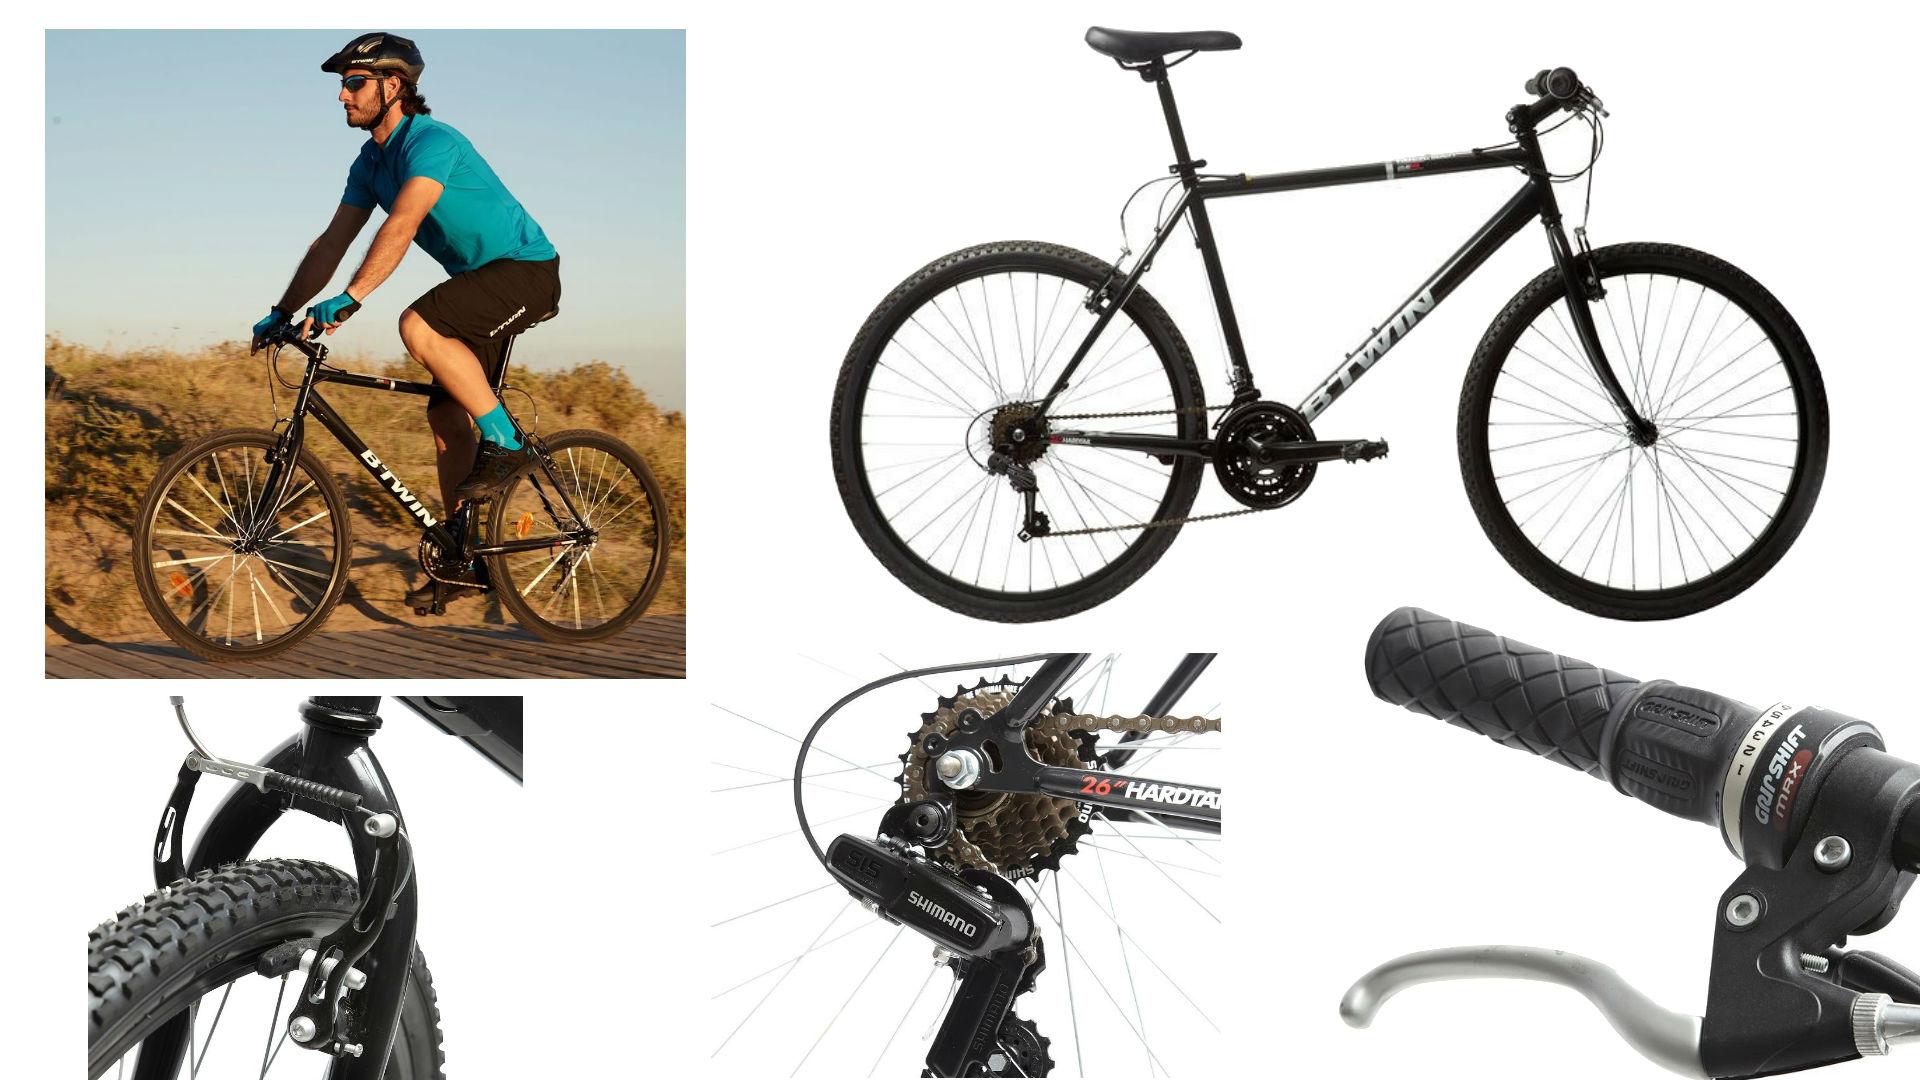 bicicleta_de_montana_btwin_rockrider_300.jpg